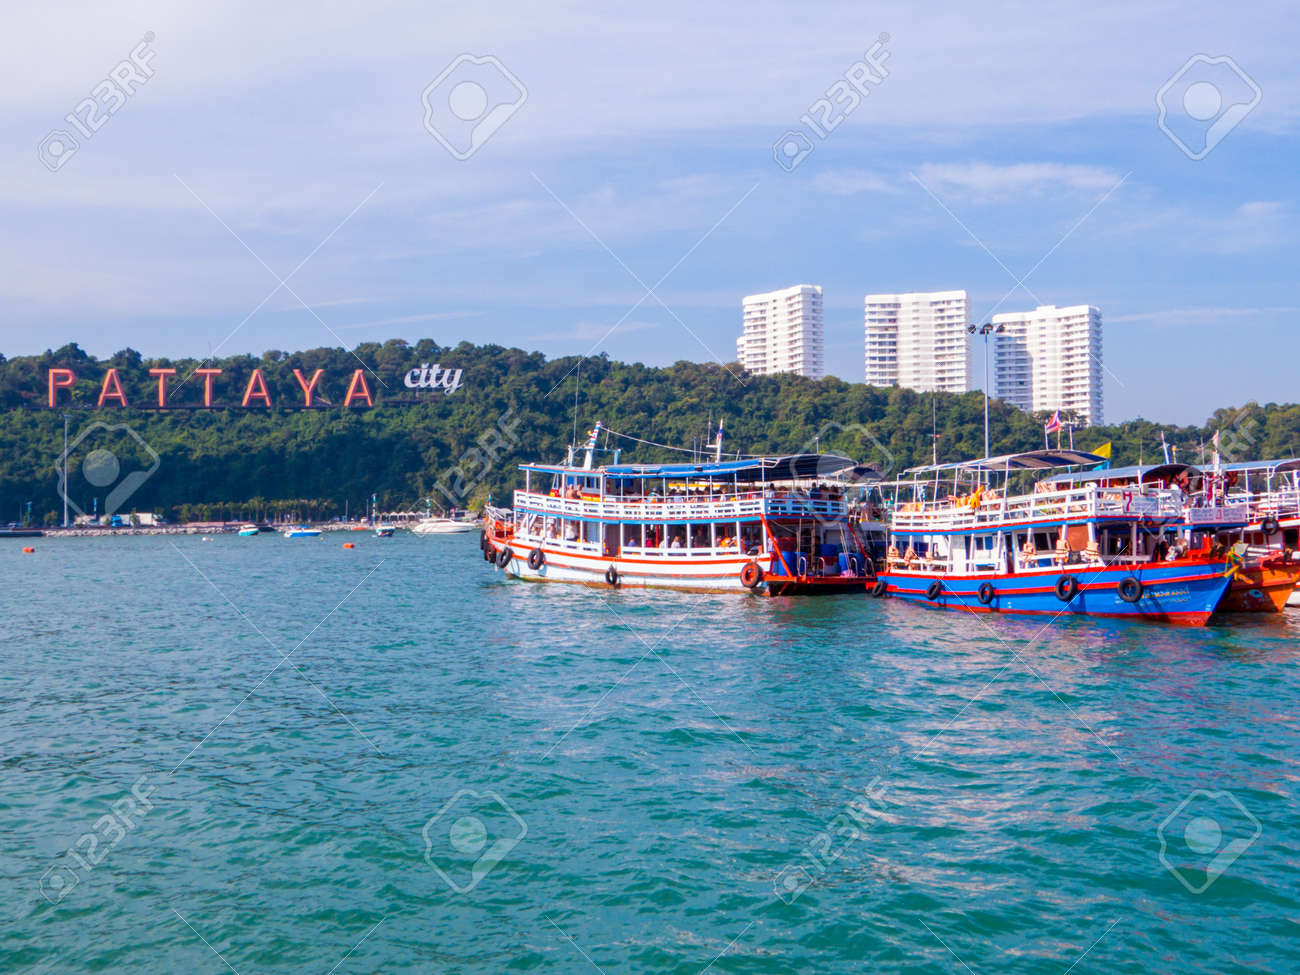 PATTAYA, THAILAND - DECEMBER 25, 2018: Boats near the Bali Hai Pier. - 151821157